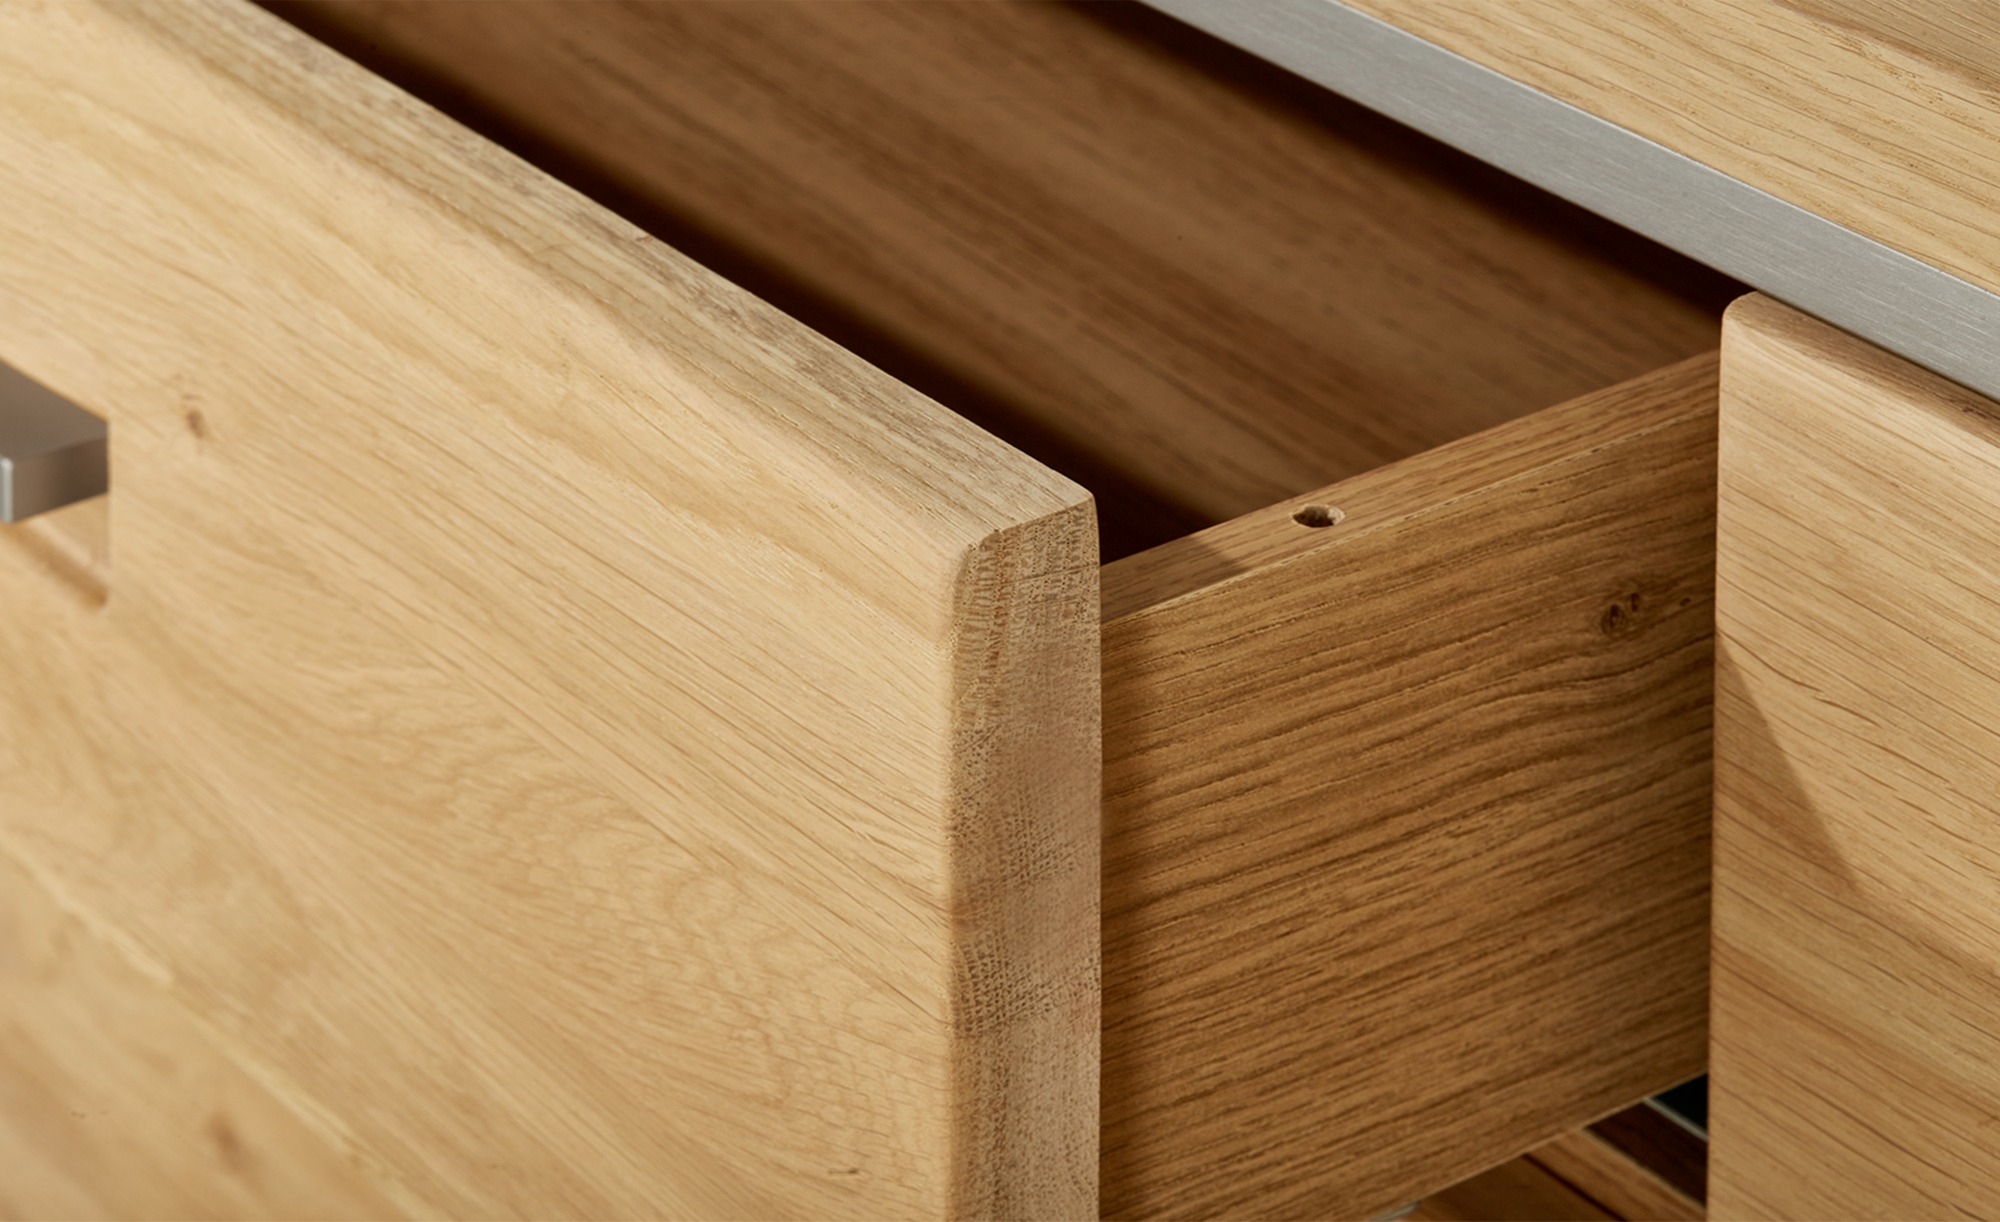 Woodford Sideboard  Felino ¦ holzfarben ¦ Maße (cm): B: 184 H: 89 T: 45 Kommoden & Sideboards > Sideboards - Höffner